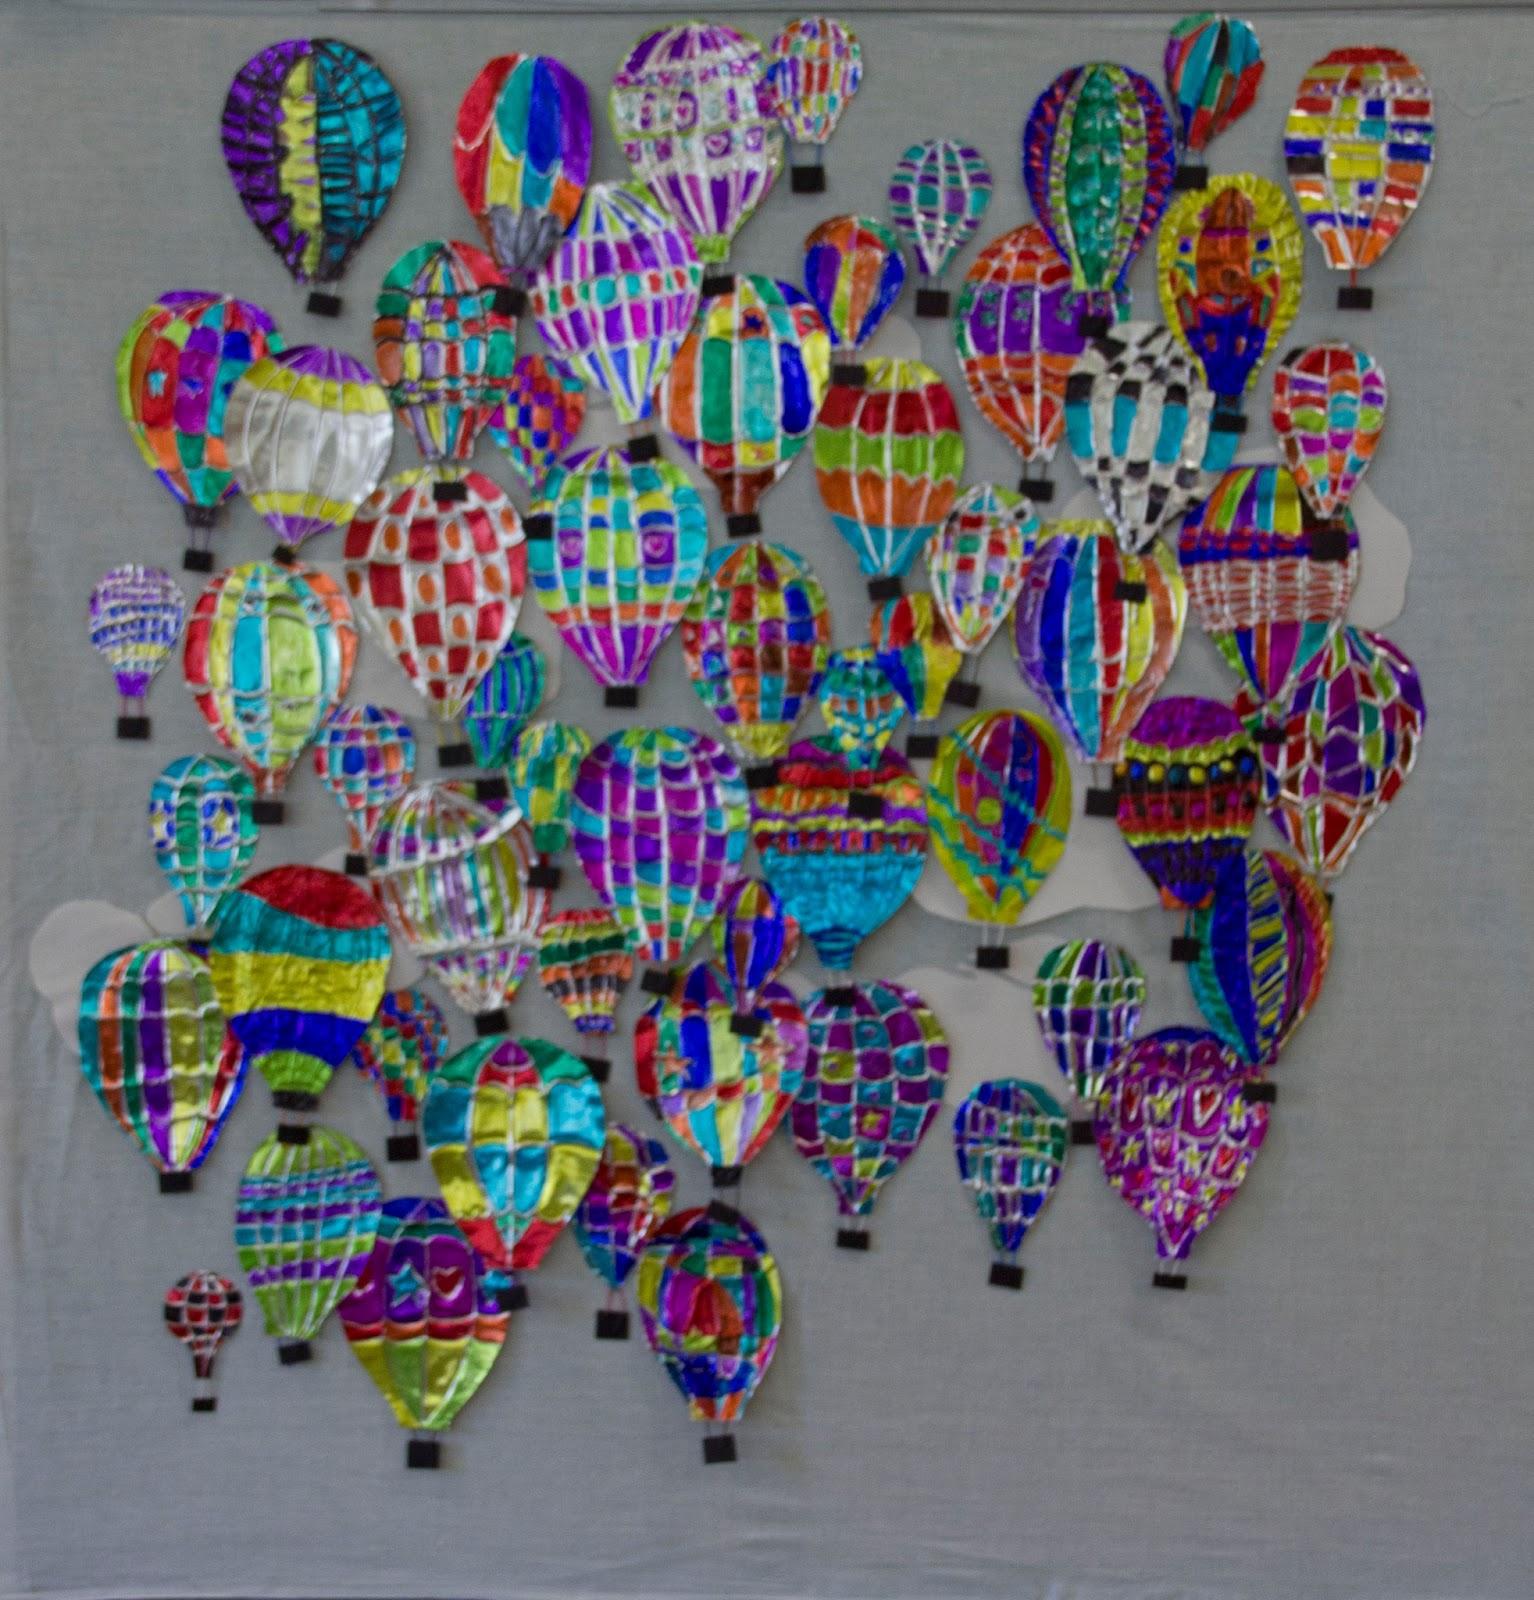 Craft Ideas Balloons: ART ON MY HANDS: Saige's Hot Air Balloon Project